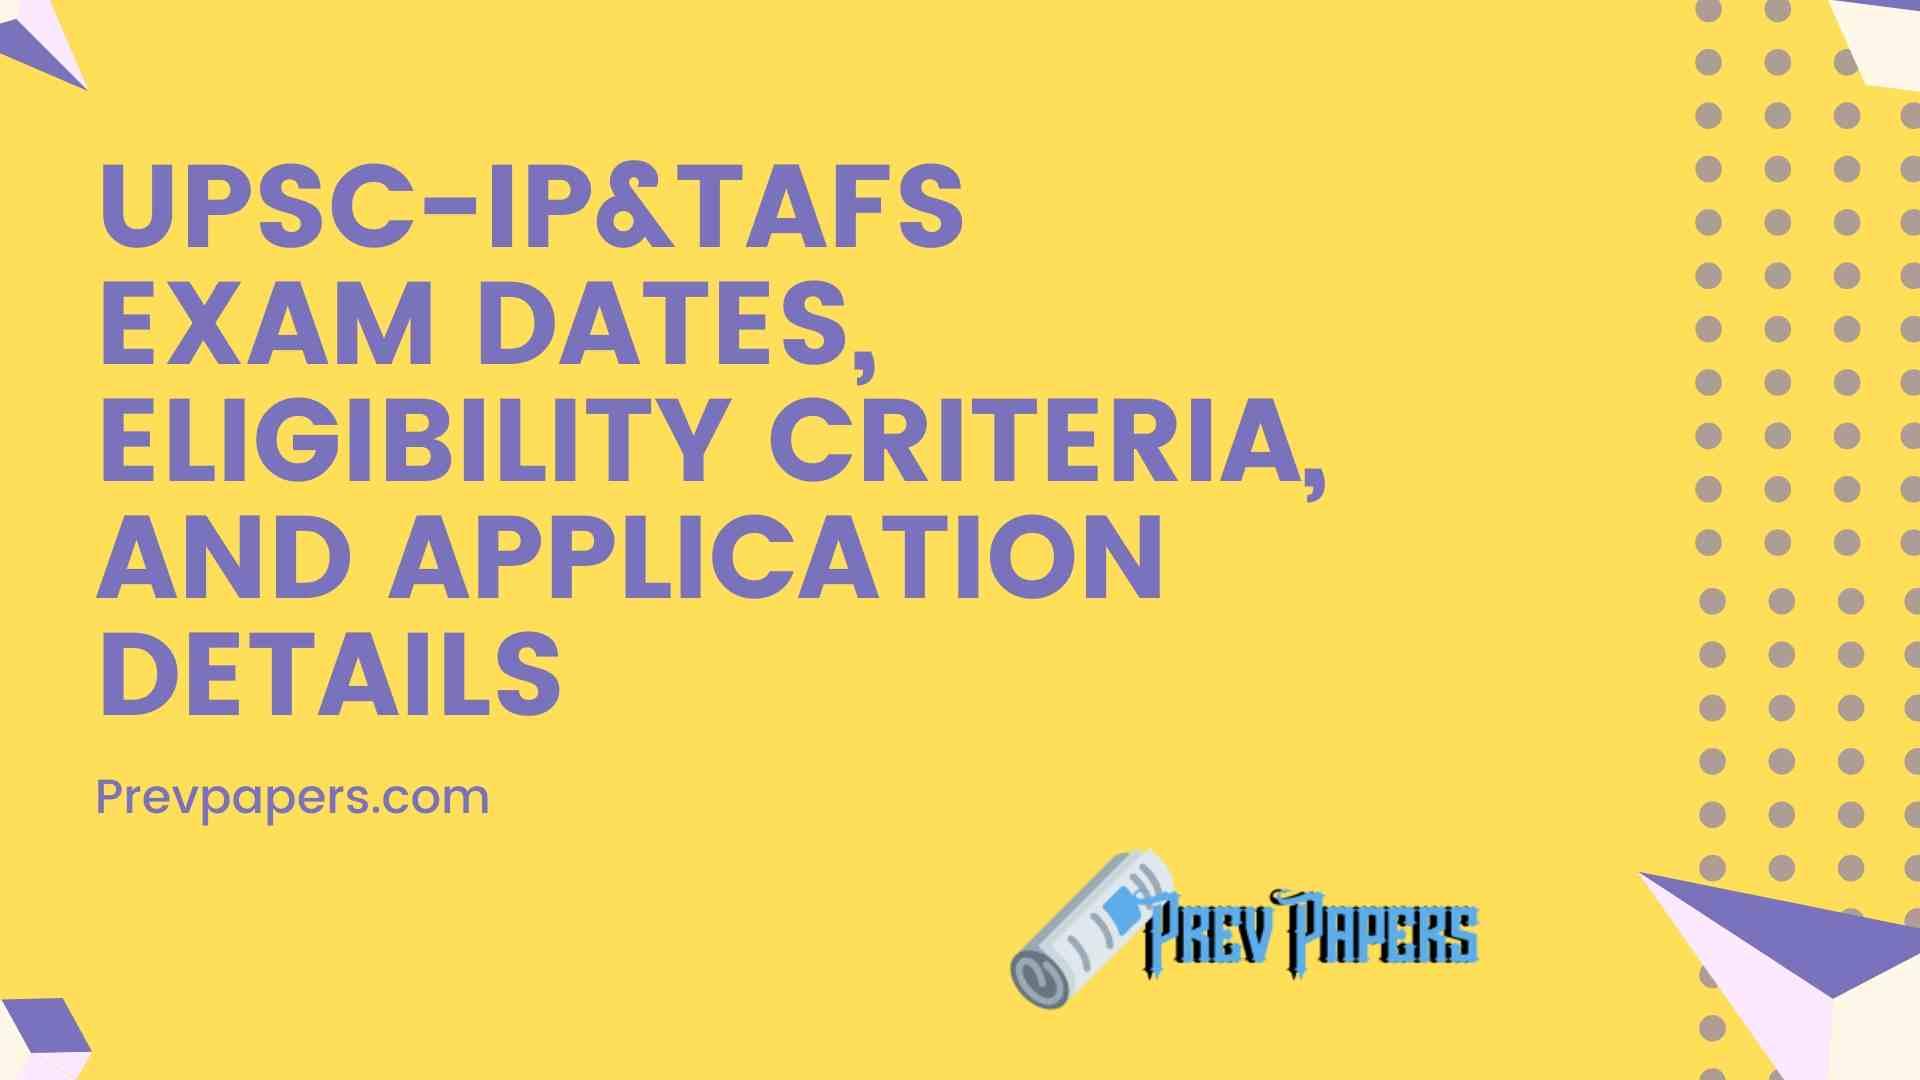 UPSC-IP&TAFS Exam Dates, Eligibility